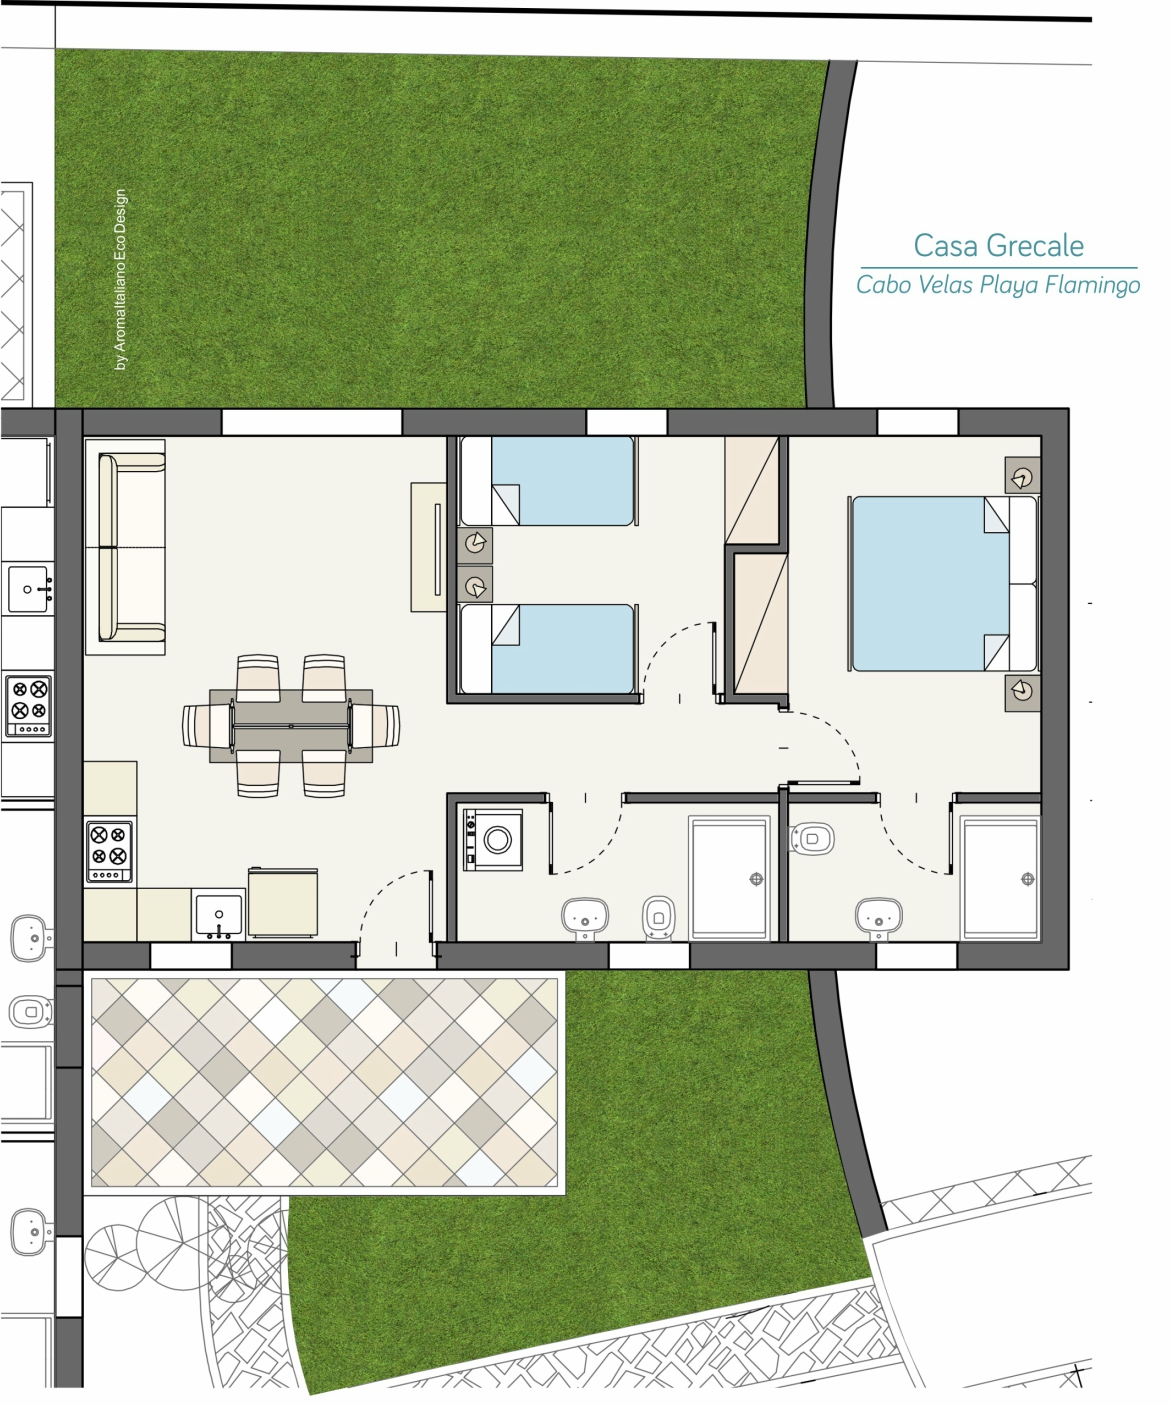 Casa Grecale - Planimetria Cabo Velas - Boutique Residences Playa Flamingo